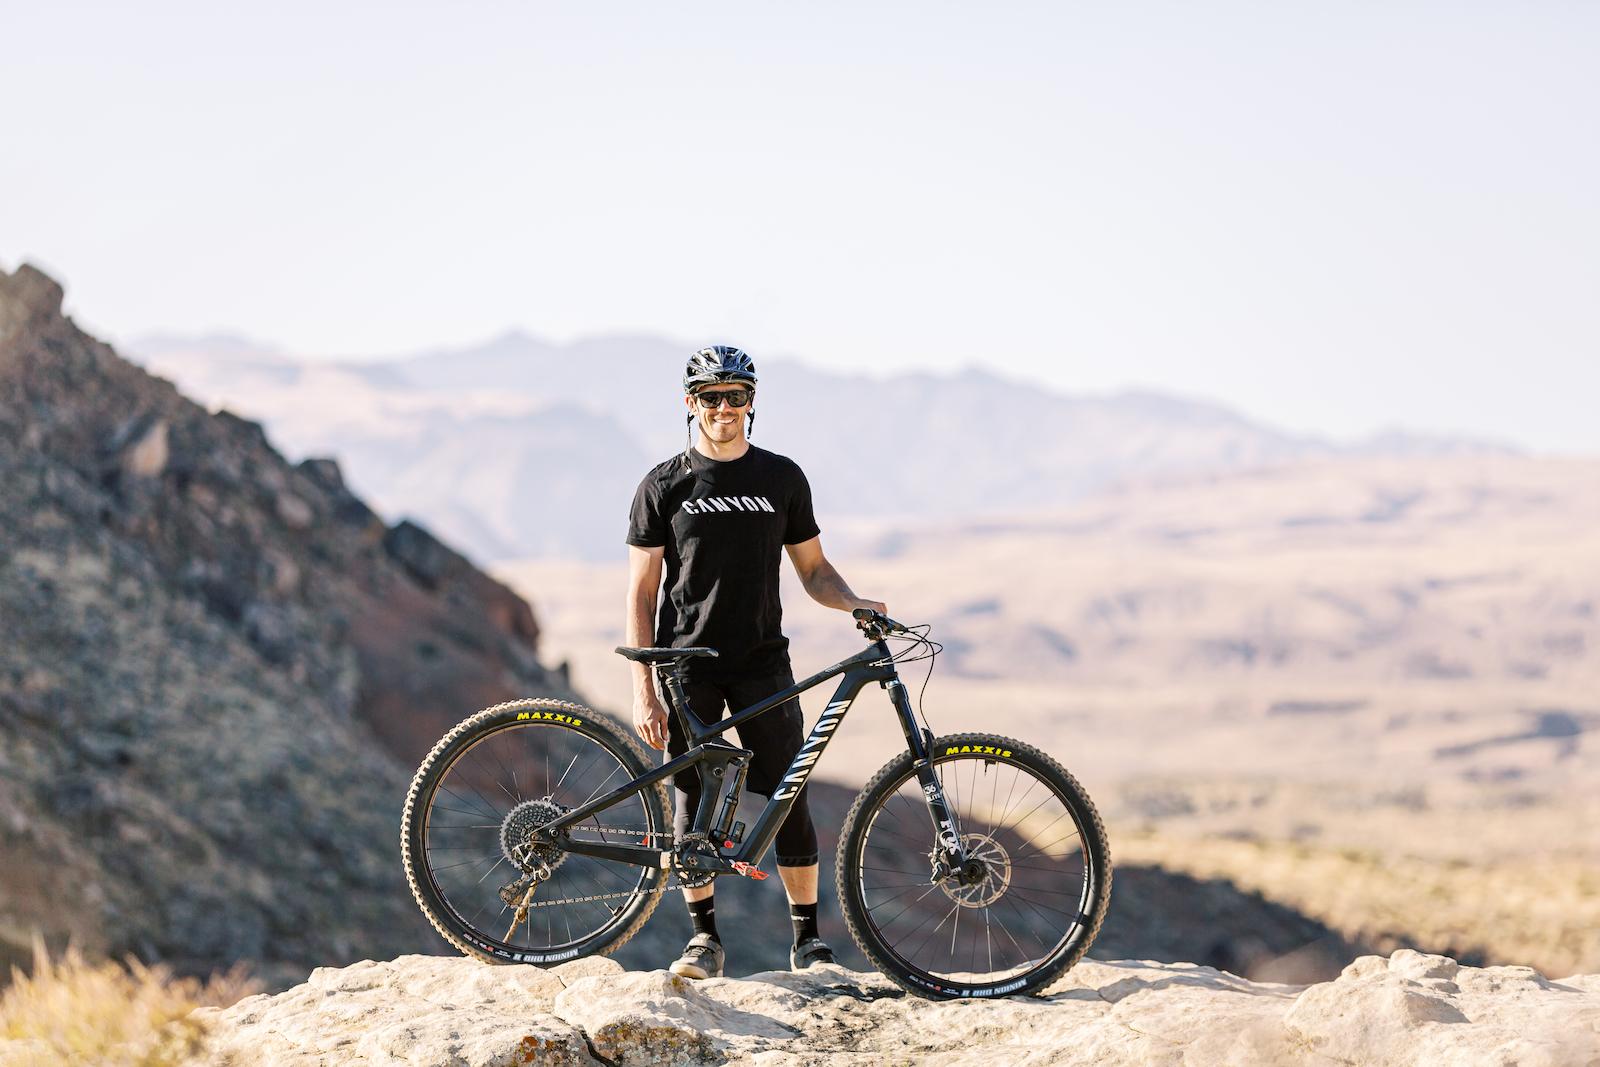 Braydon Bringhurst AKA BikerBrayd rides his Canyon Strive a bit differently from the average Joe.